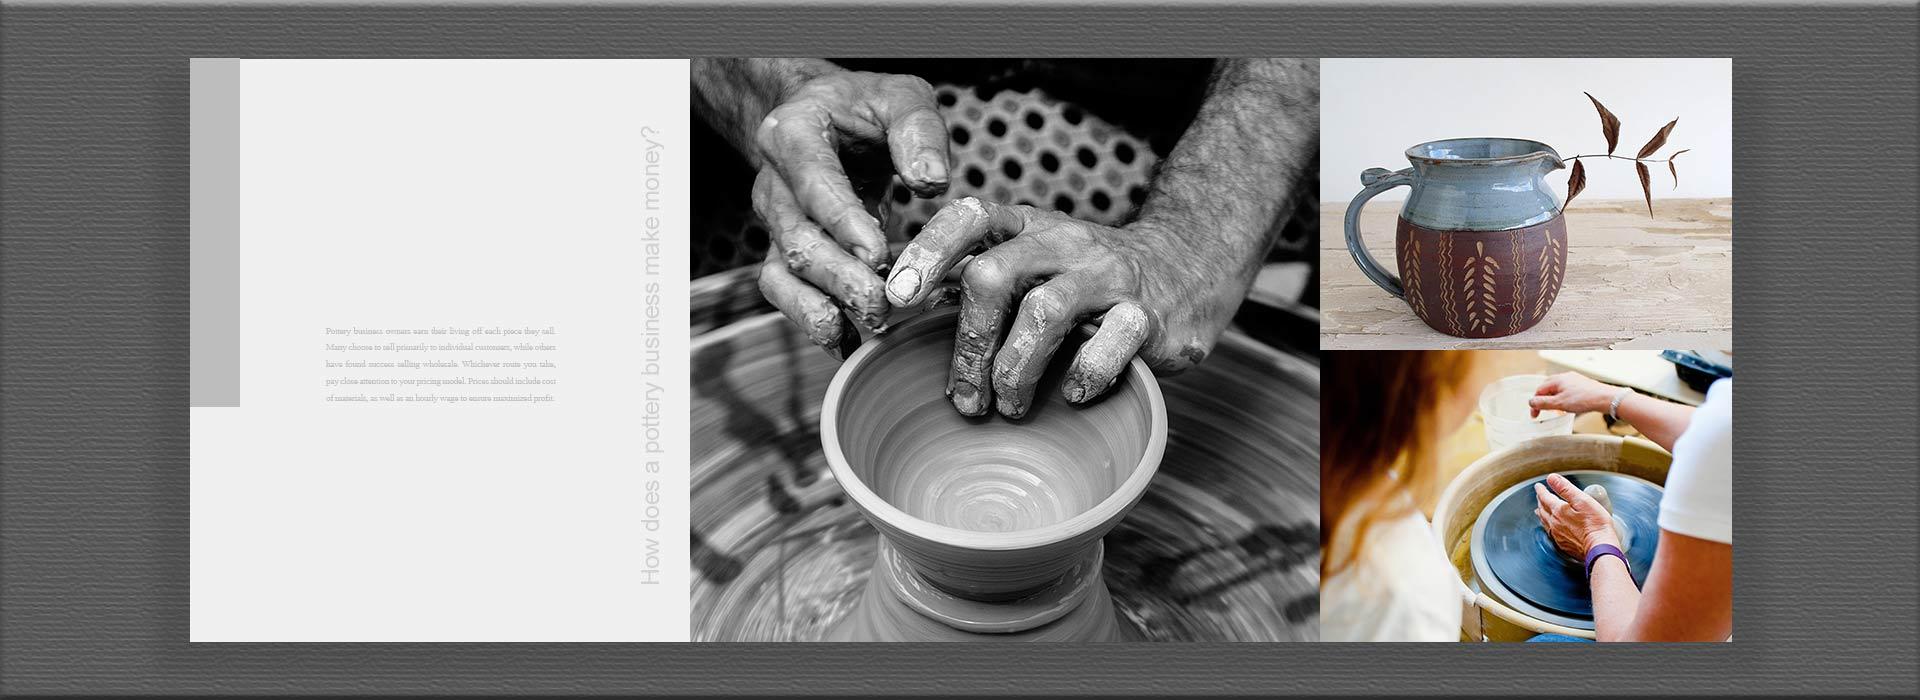 How does  pottery business make money - چگونه کسب و کار سفالگری راه اندازی کنیم ؟